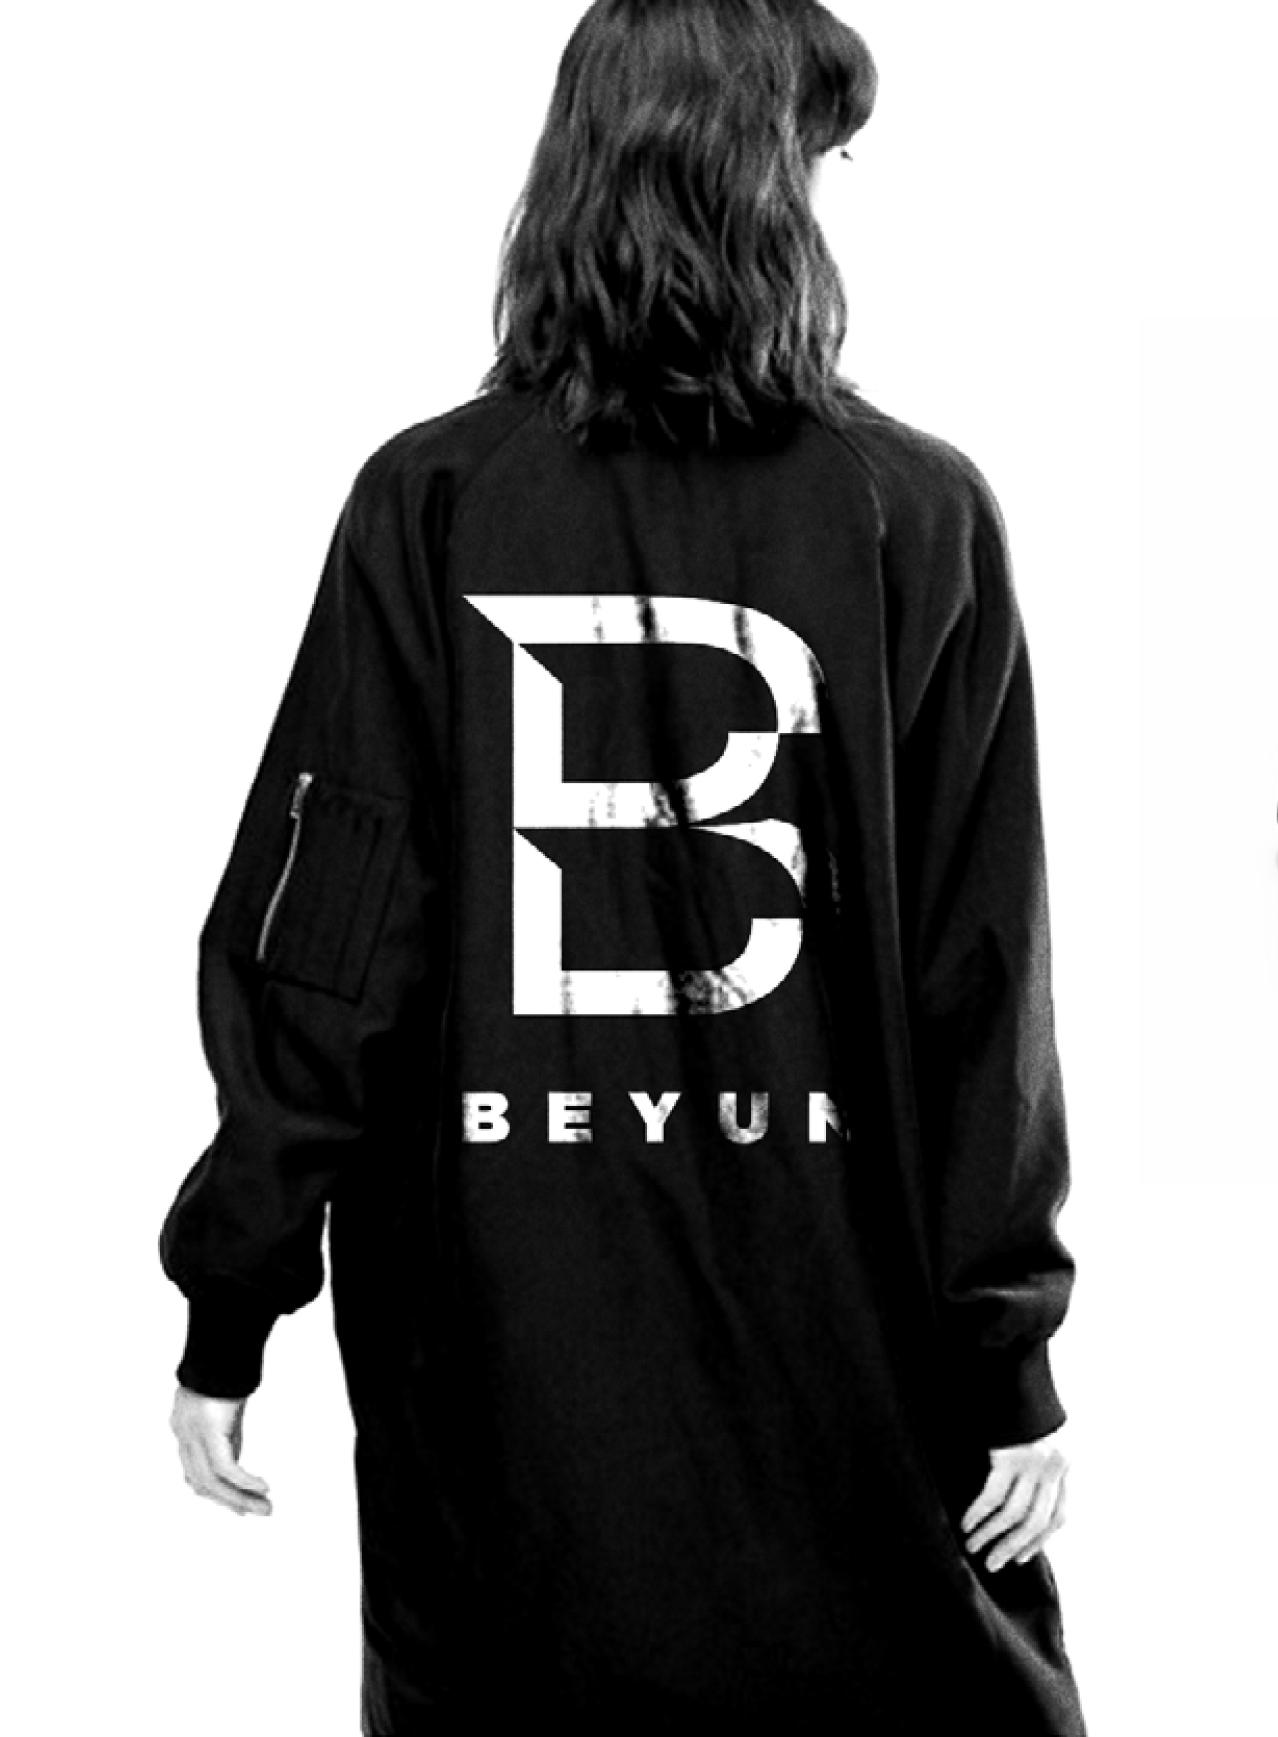 beyun_long_jacket.jpg